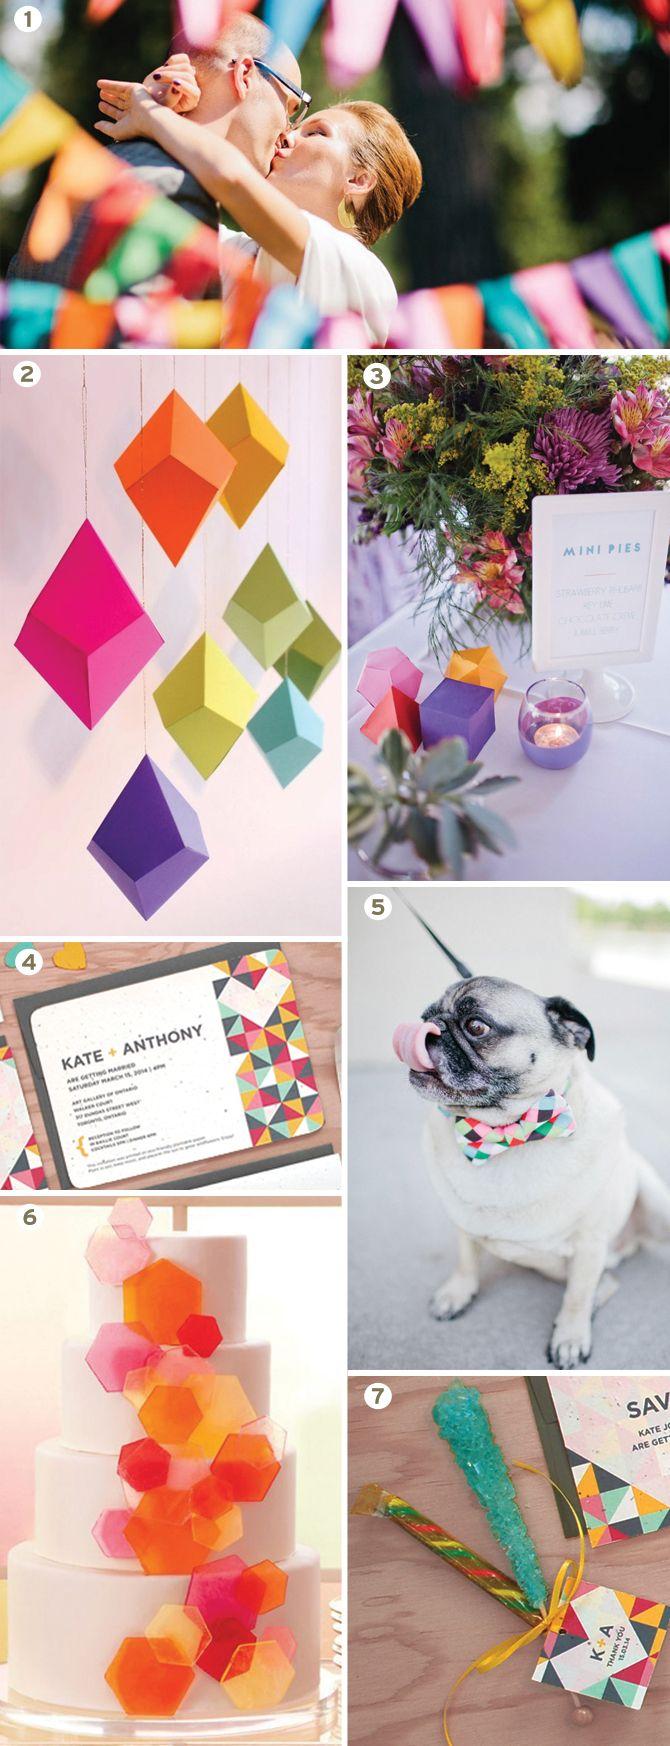 Geometric wedding inspiration board